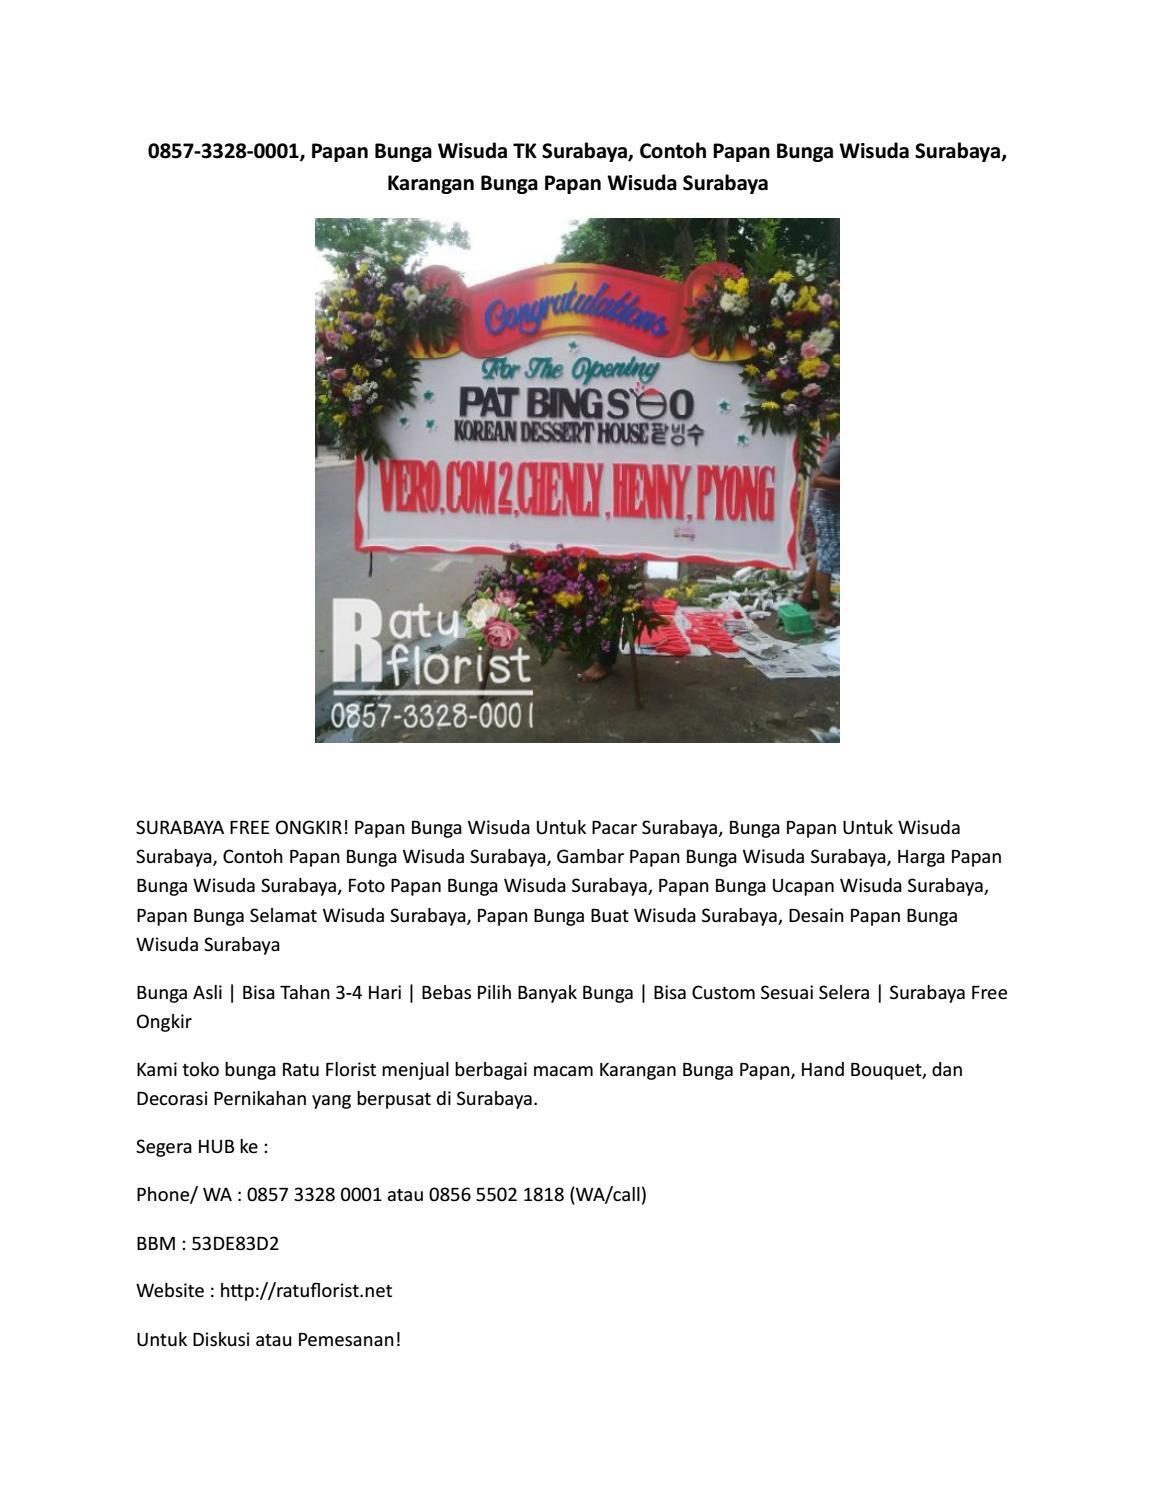 0857 3328 0001 Papan Bunga Wisuda Tk Surabaya Contoh Papan Bunga Wisuda Surabaya Karangan Bunga P By Ratu Florist Surabaya Issuu